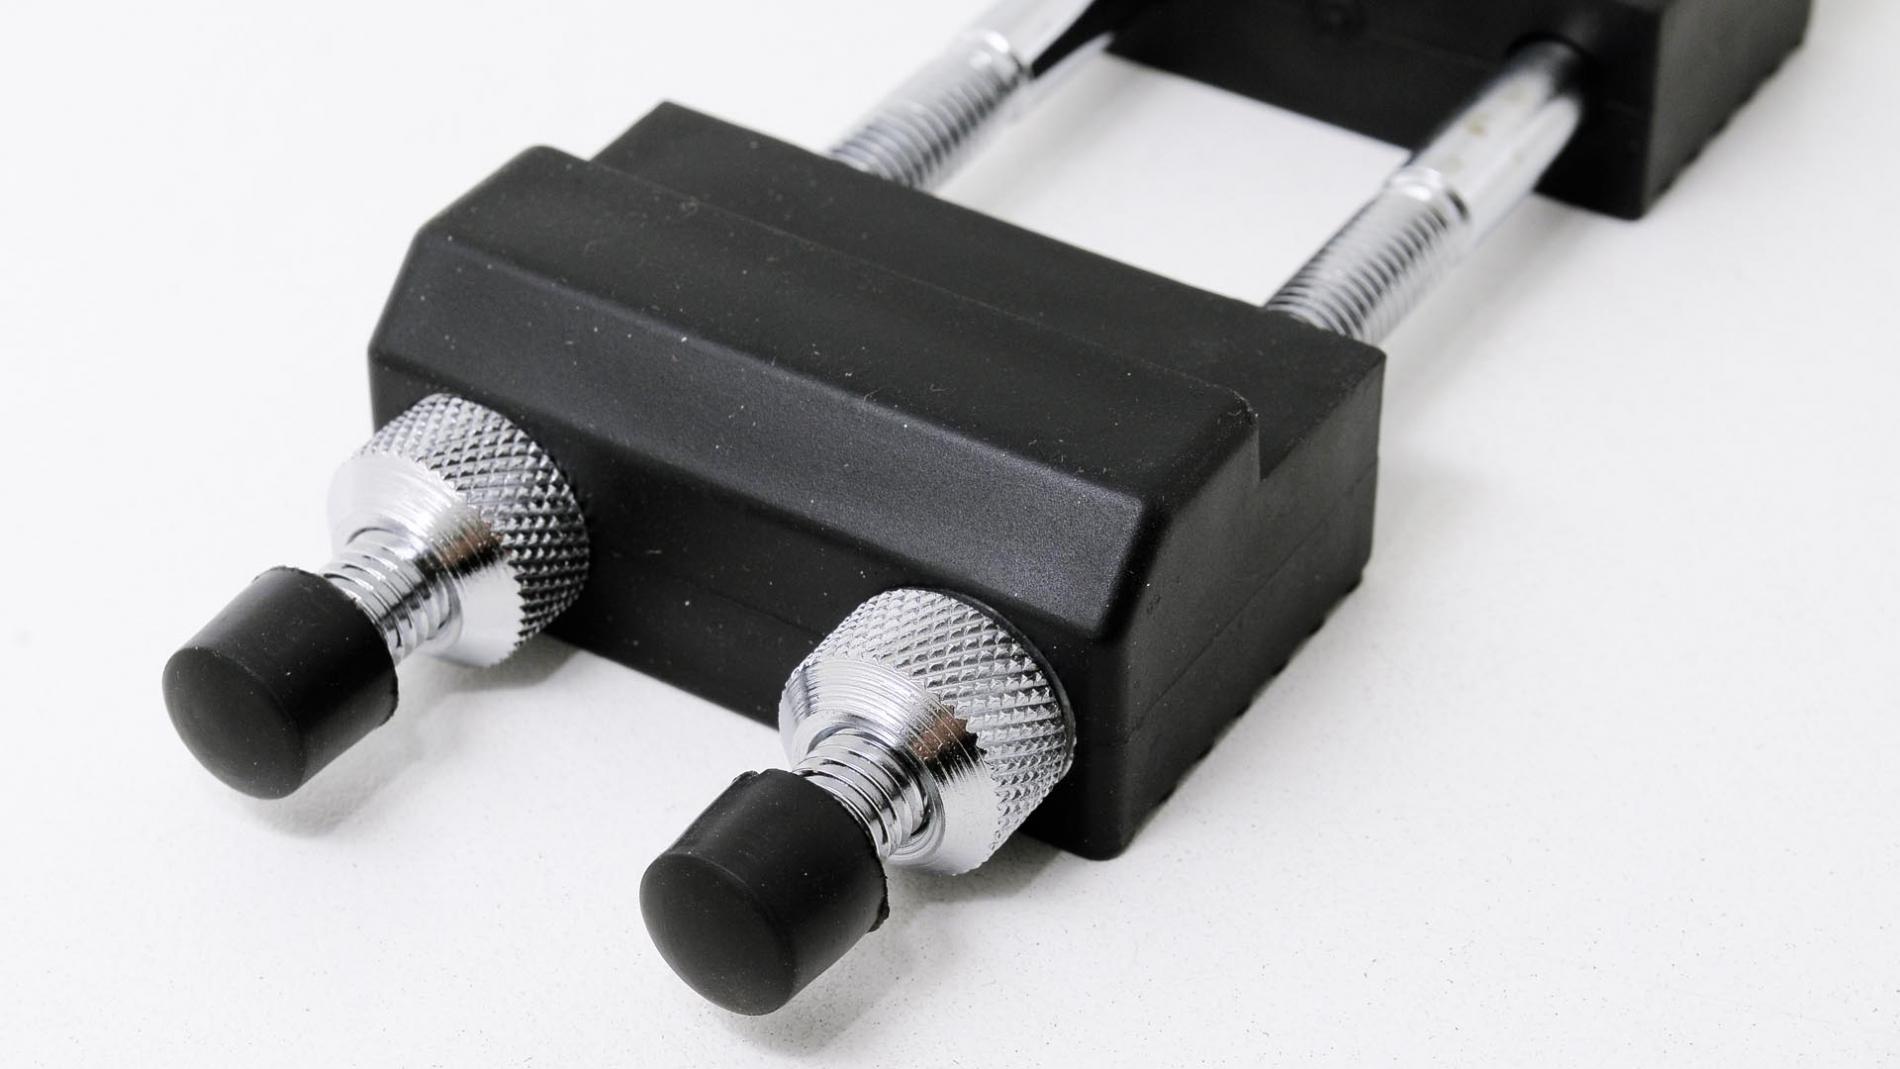 GUB0023-Base con 3 soportes para piedras de afilar con tuercas GUB0023-max-3.